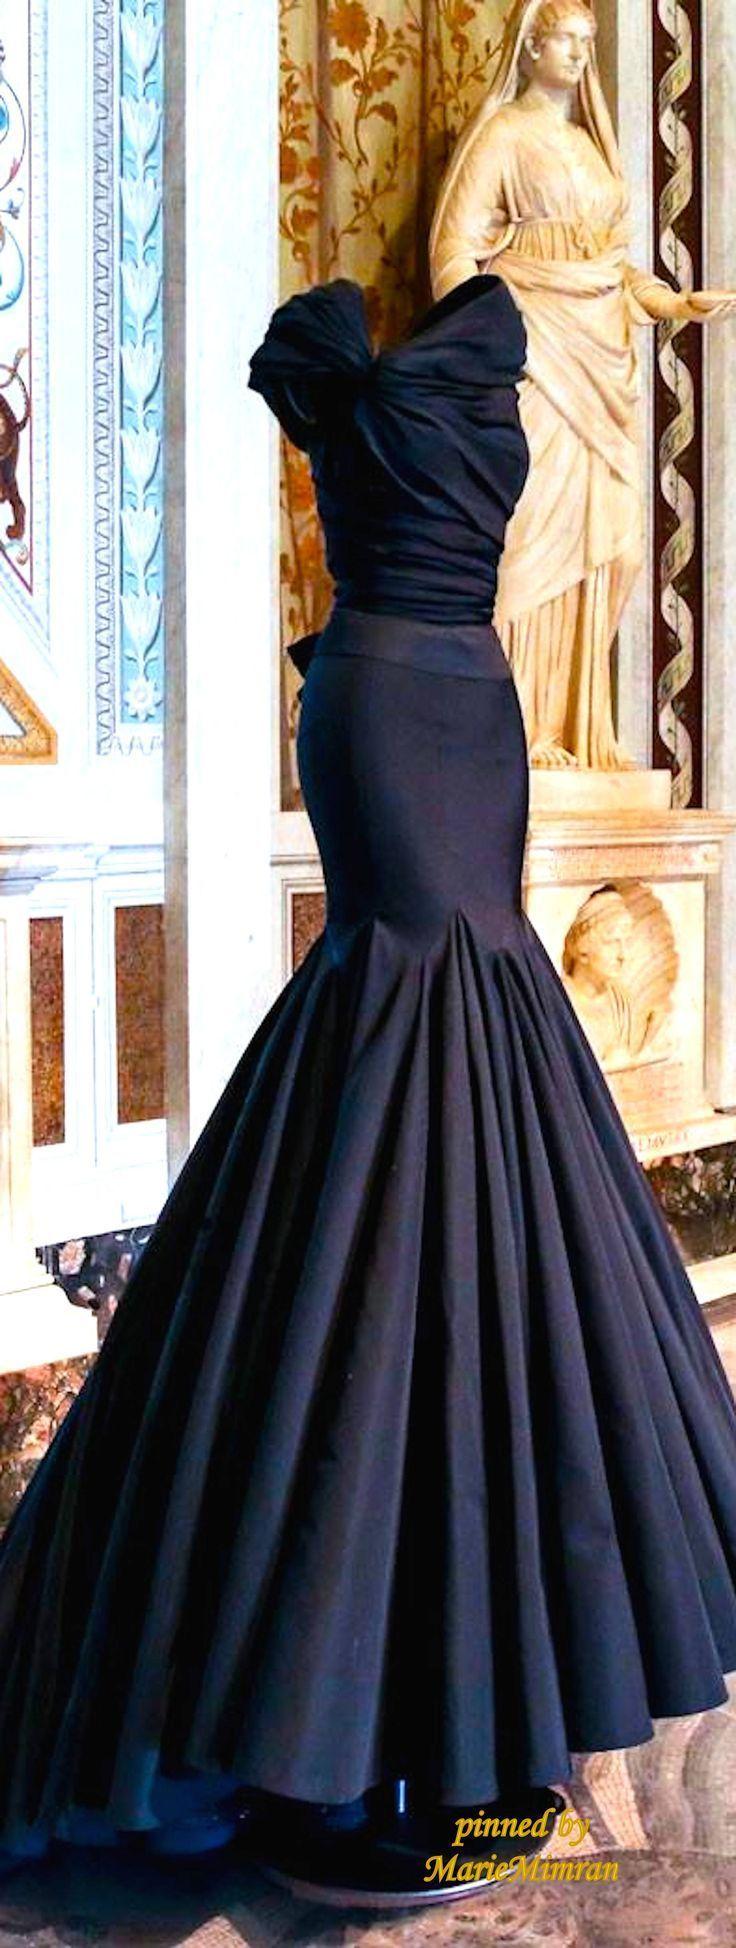 Azzedine Alaia Couture. I'm dying inside- it's so perfect. #wedding #weddingdress